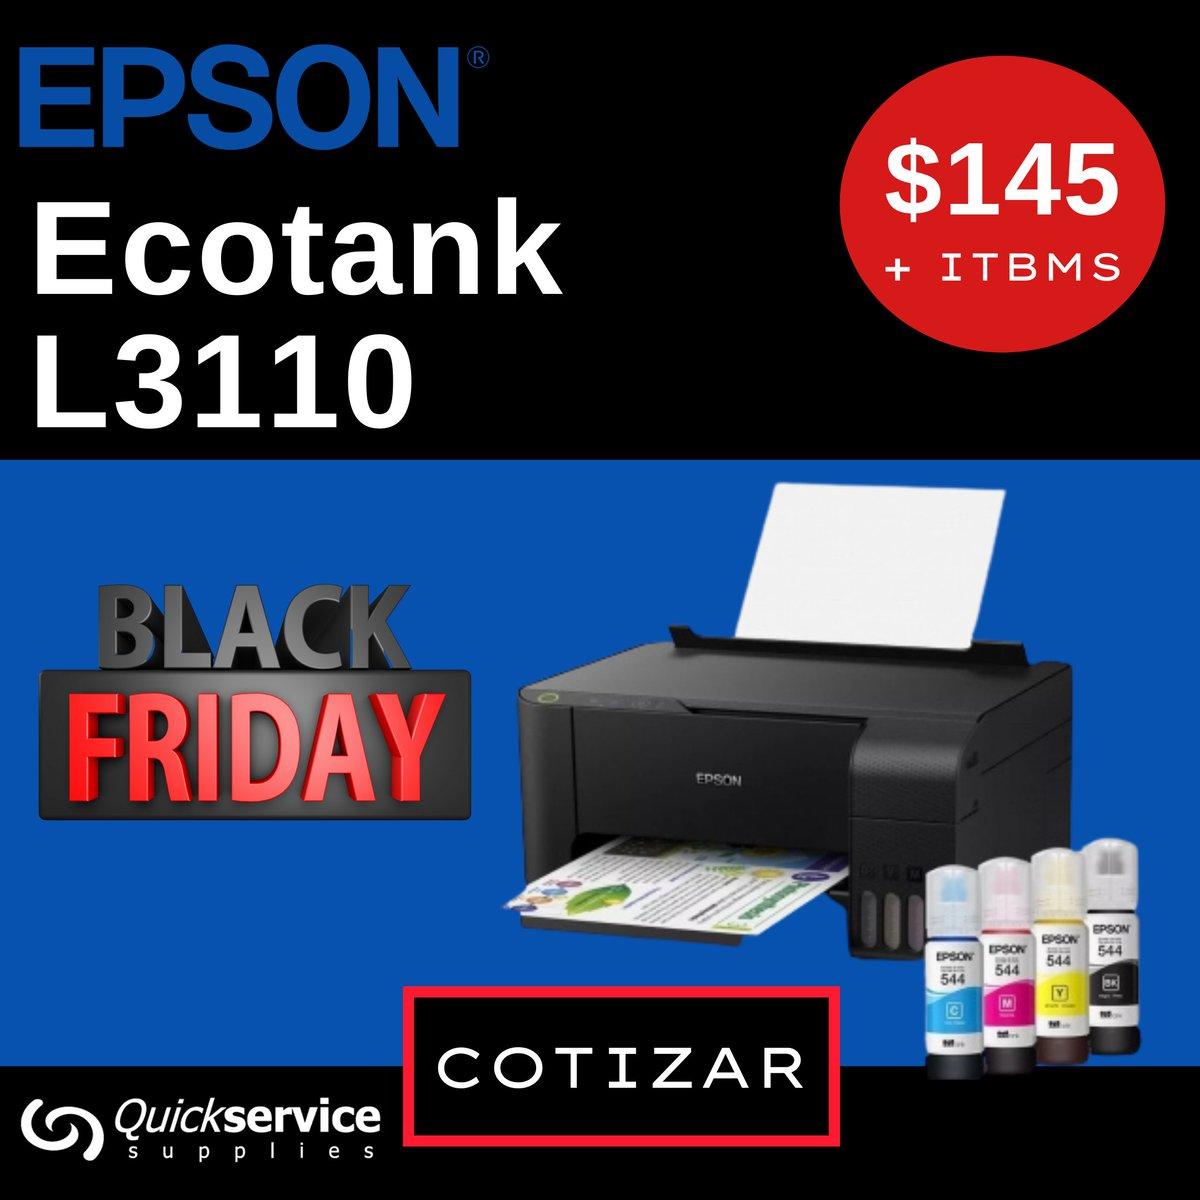 😎 Multifuncional de Sistema de Botellas de Tintas Epson Ecotank L3110 Precio: B/.145.00 + ITBMS hasta agotar #impresora #epson #panama #arraijan #lachorrera #pty #ecotank #printer